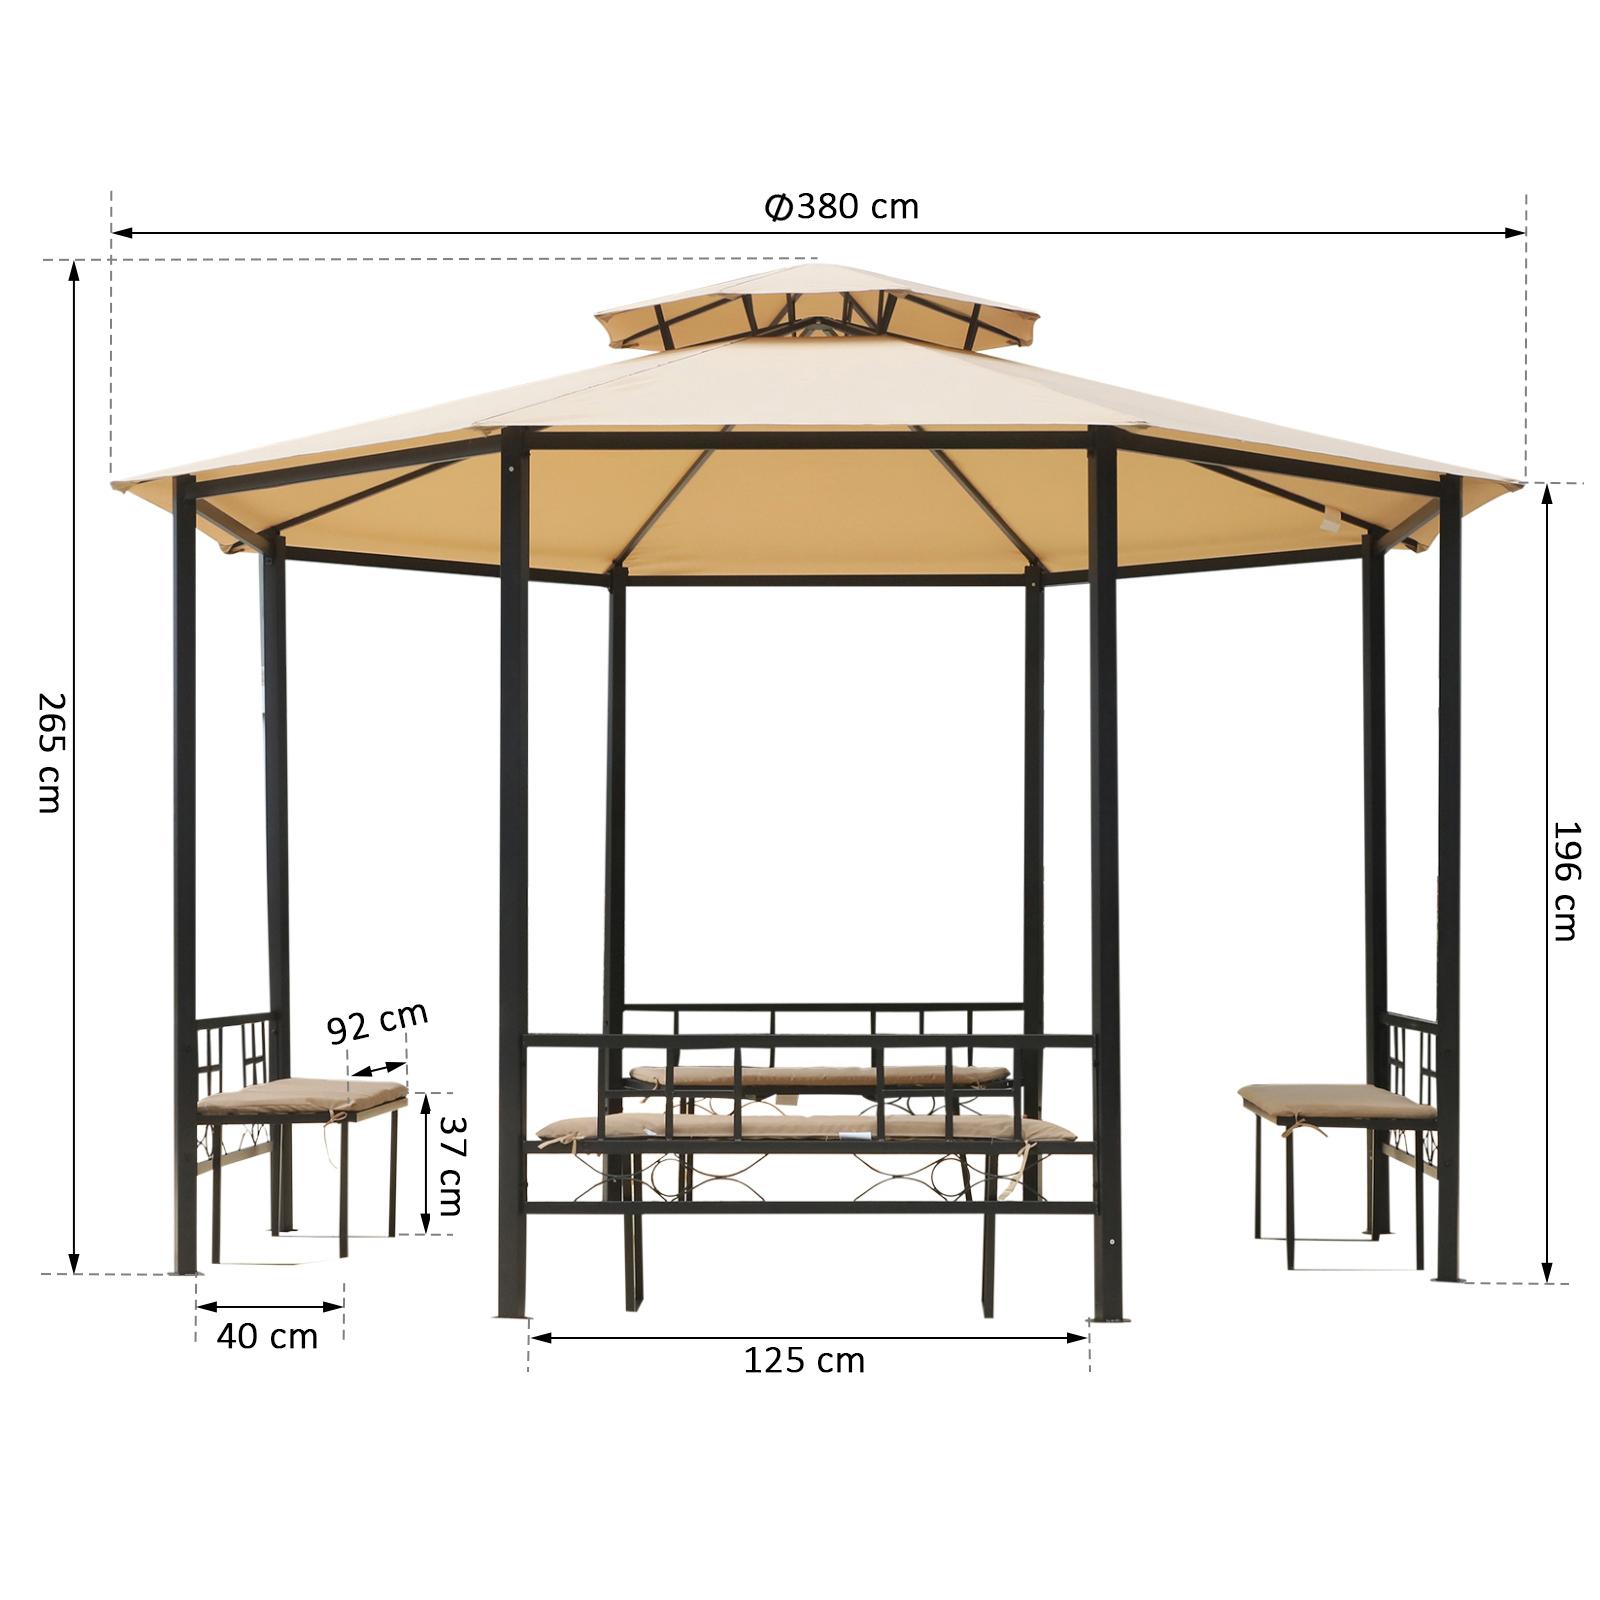 Outsunny Gartenpavillon Pavillon Festzelt Partyzelt mit Seitenwänden 3x3,65m